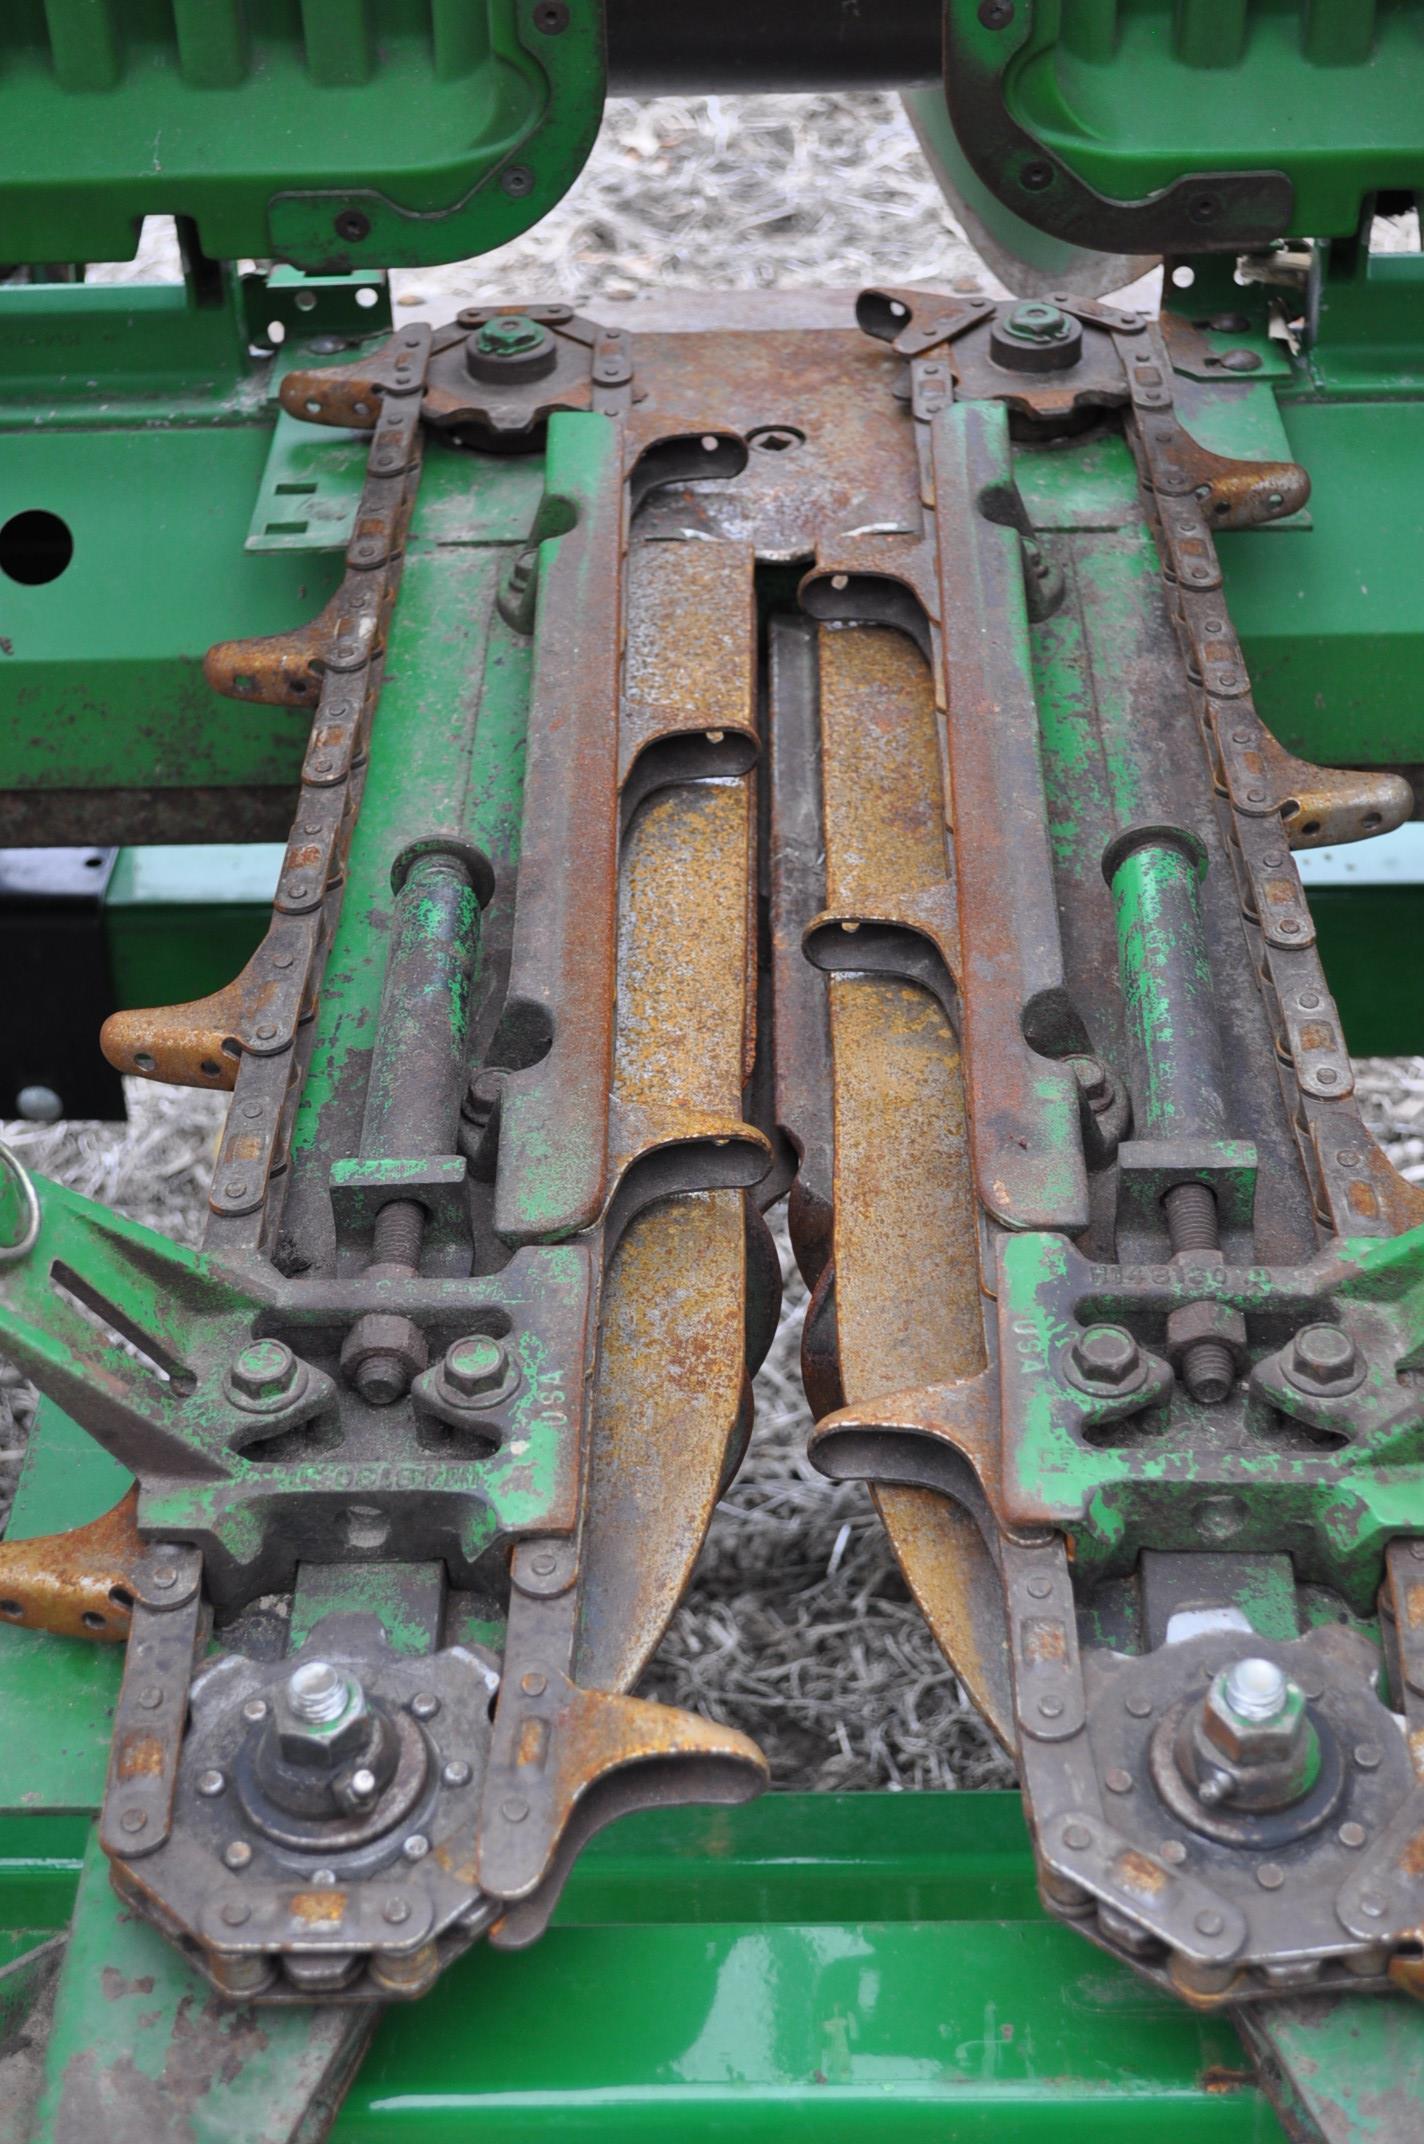 John Deere 693 corn head, poly, hyd drive, down corn reel, pto shafts, SN 655654 - Image 13 of 17